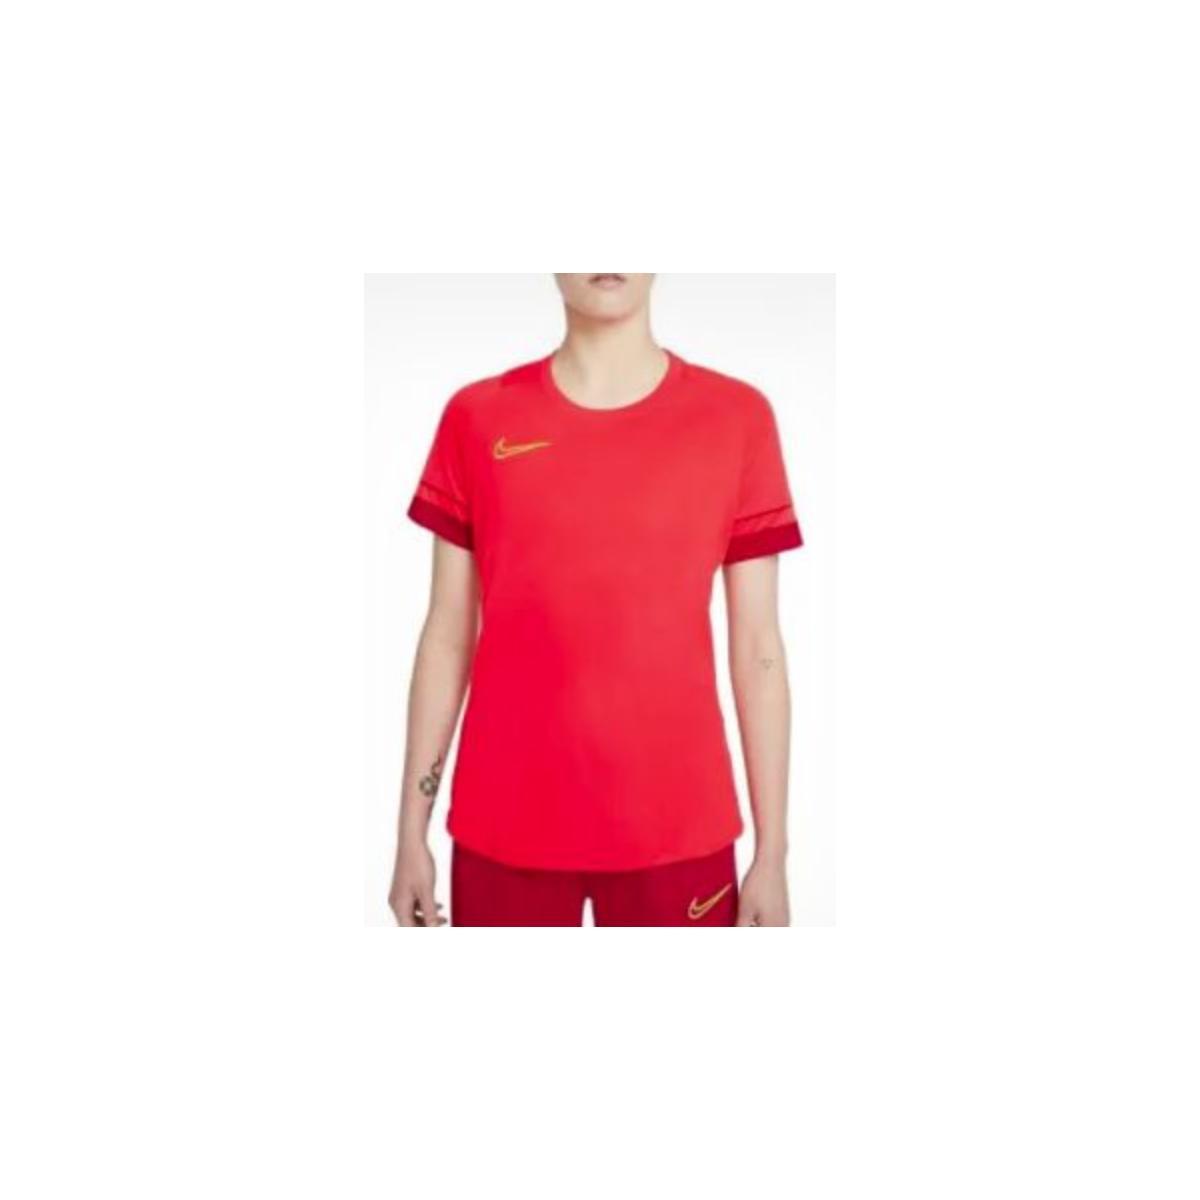 T-shirt Feminino Nike Cv2627-635 Dri-fit Academy Laranja Neon